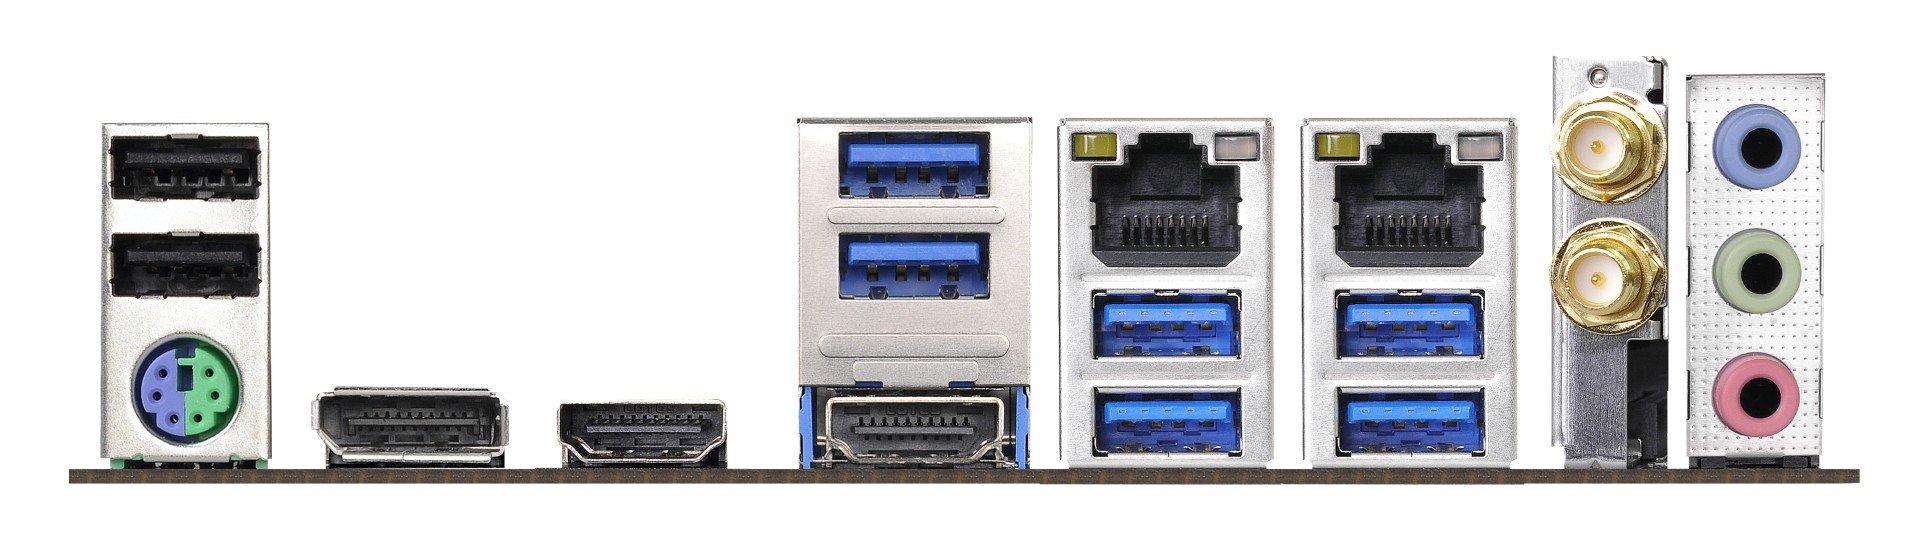 ASRock H370M-ITX ac